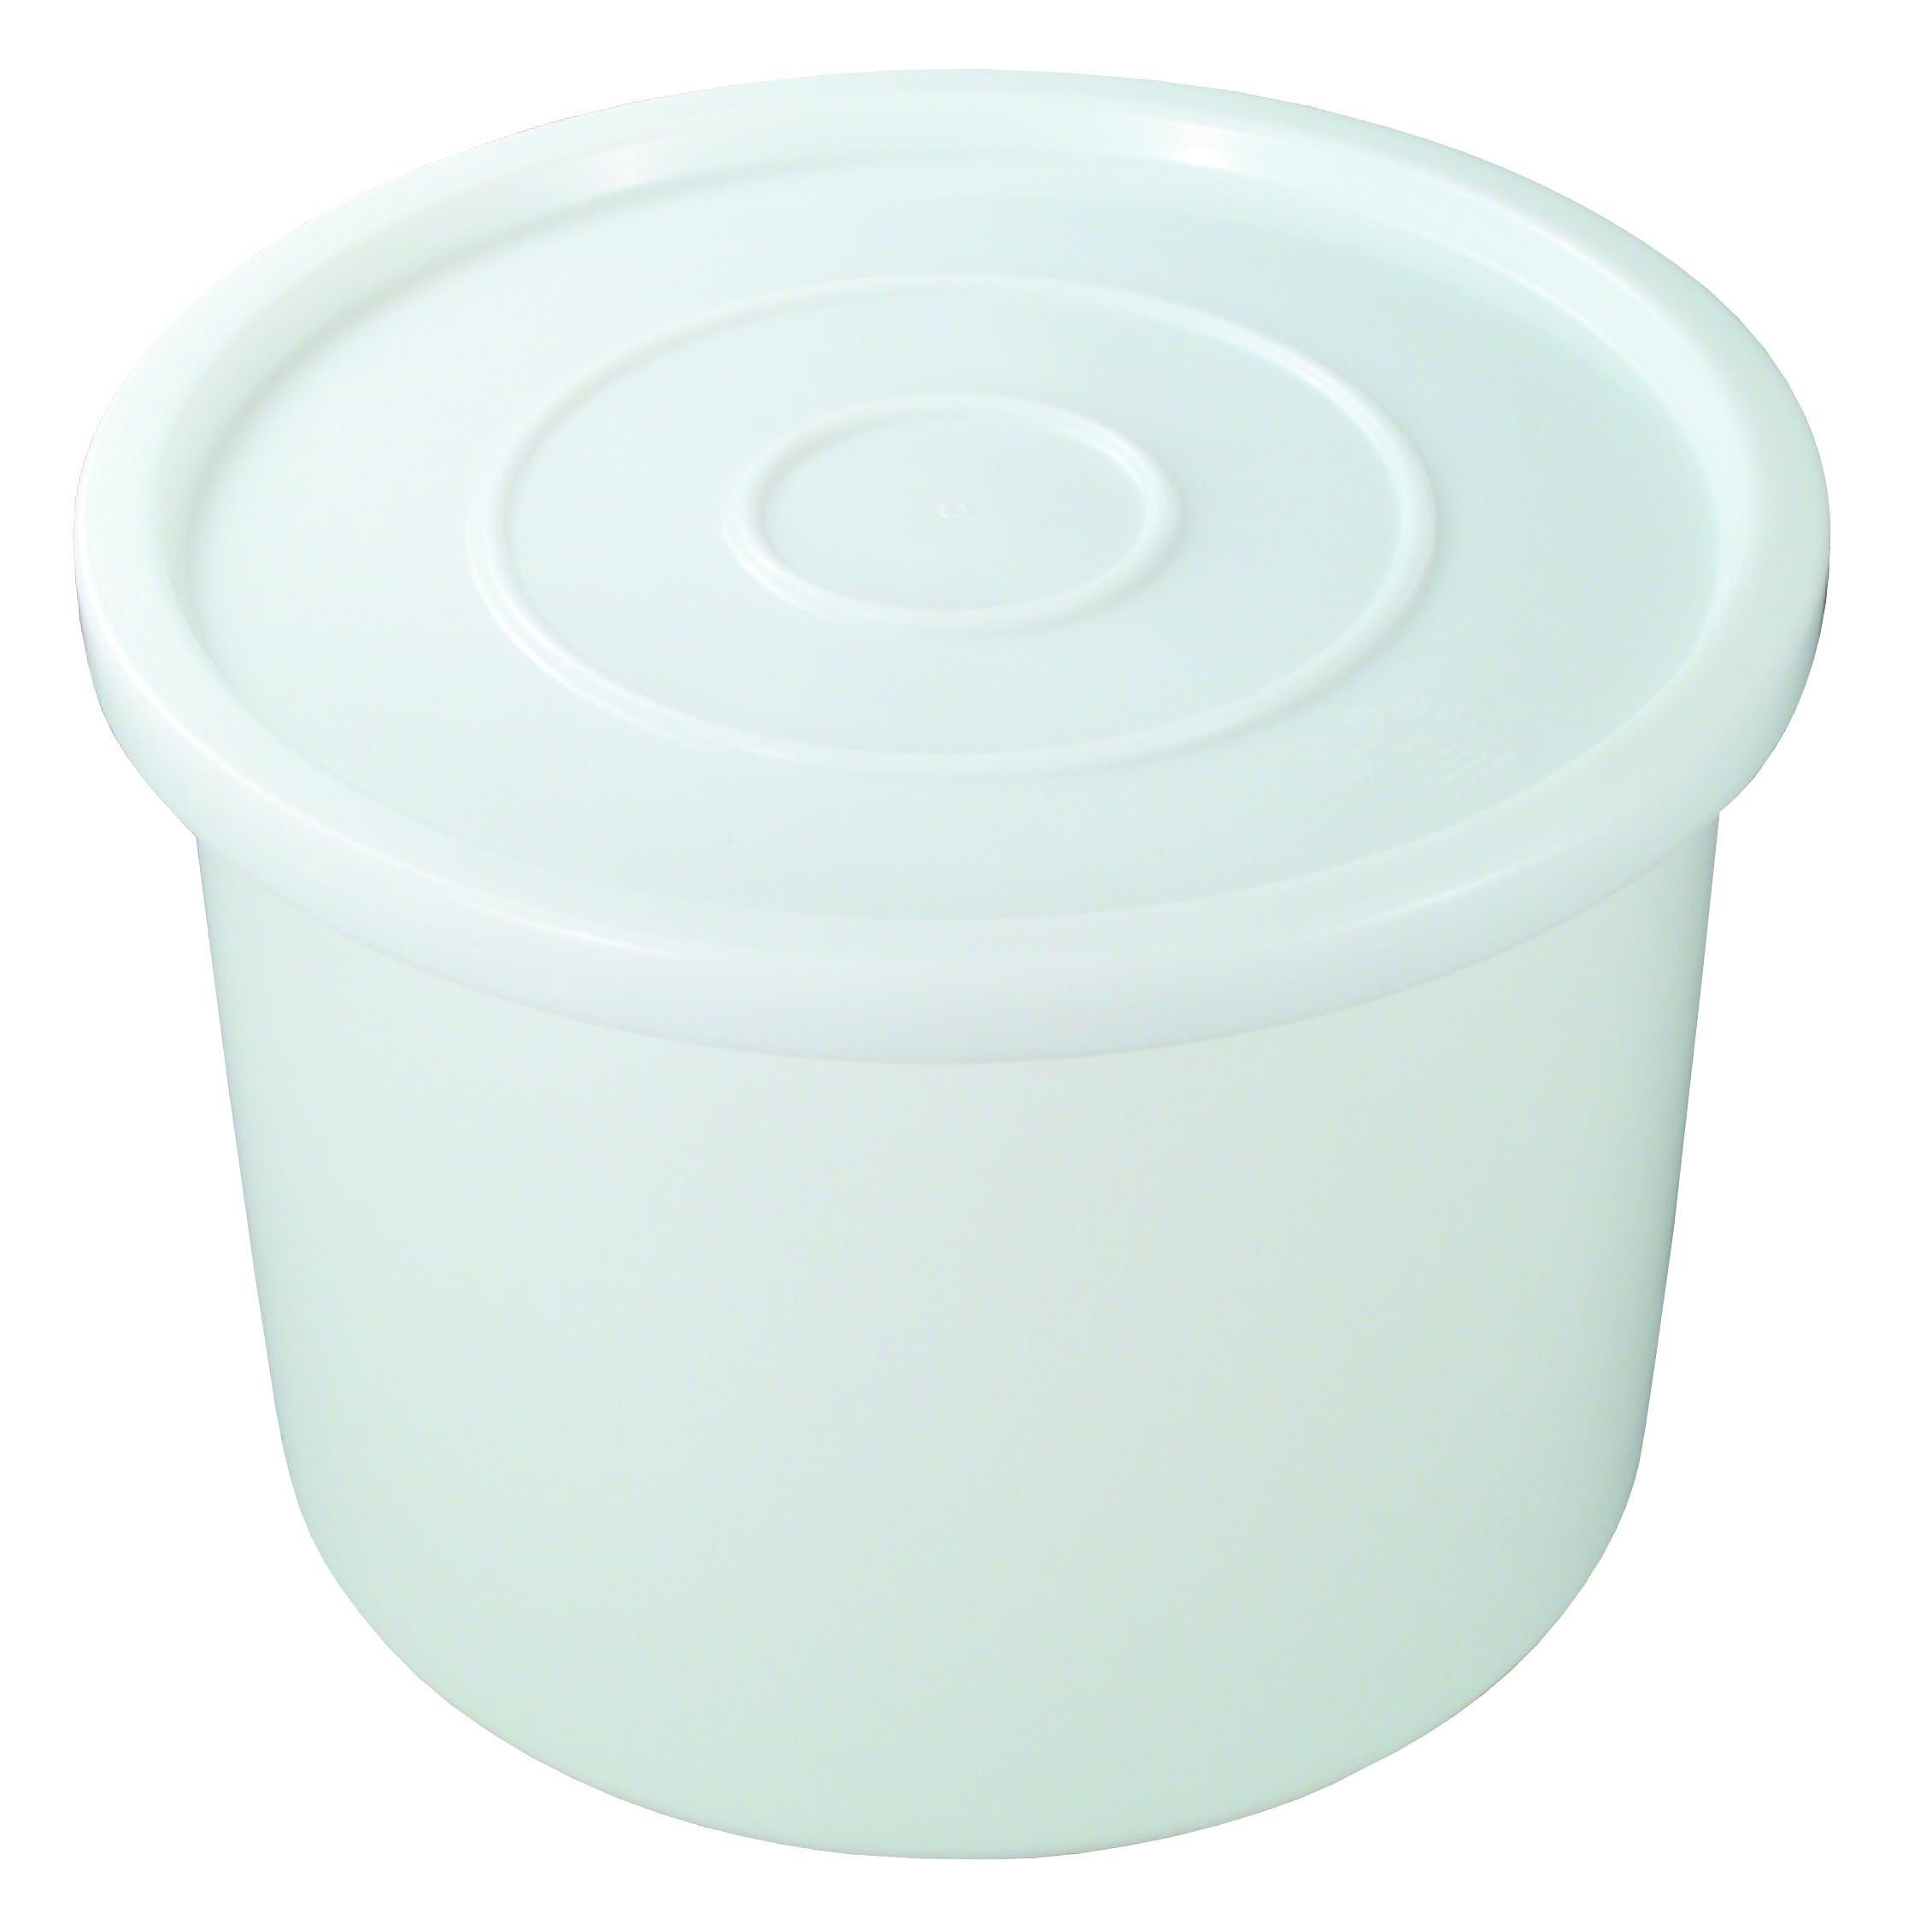 toy apple kitchen hidden box gloss home co seat uk abs storage dp tub green basket stool laundry ottoman amazon